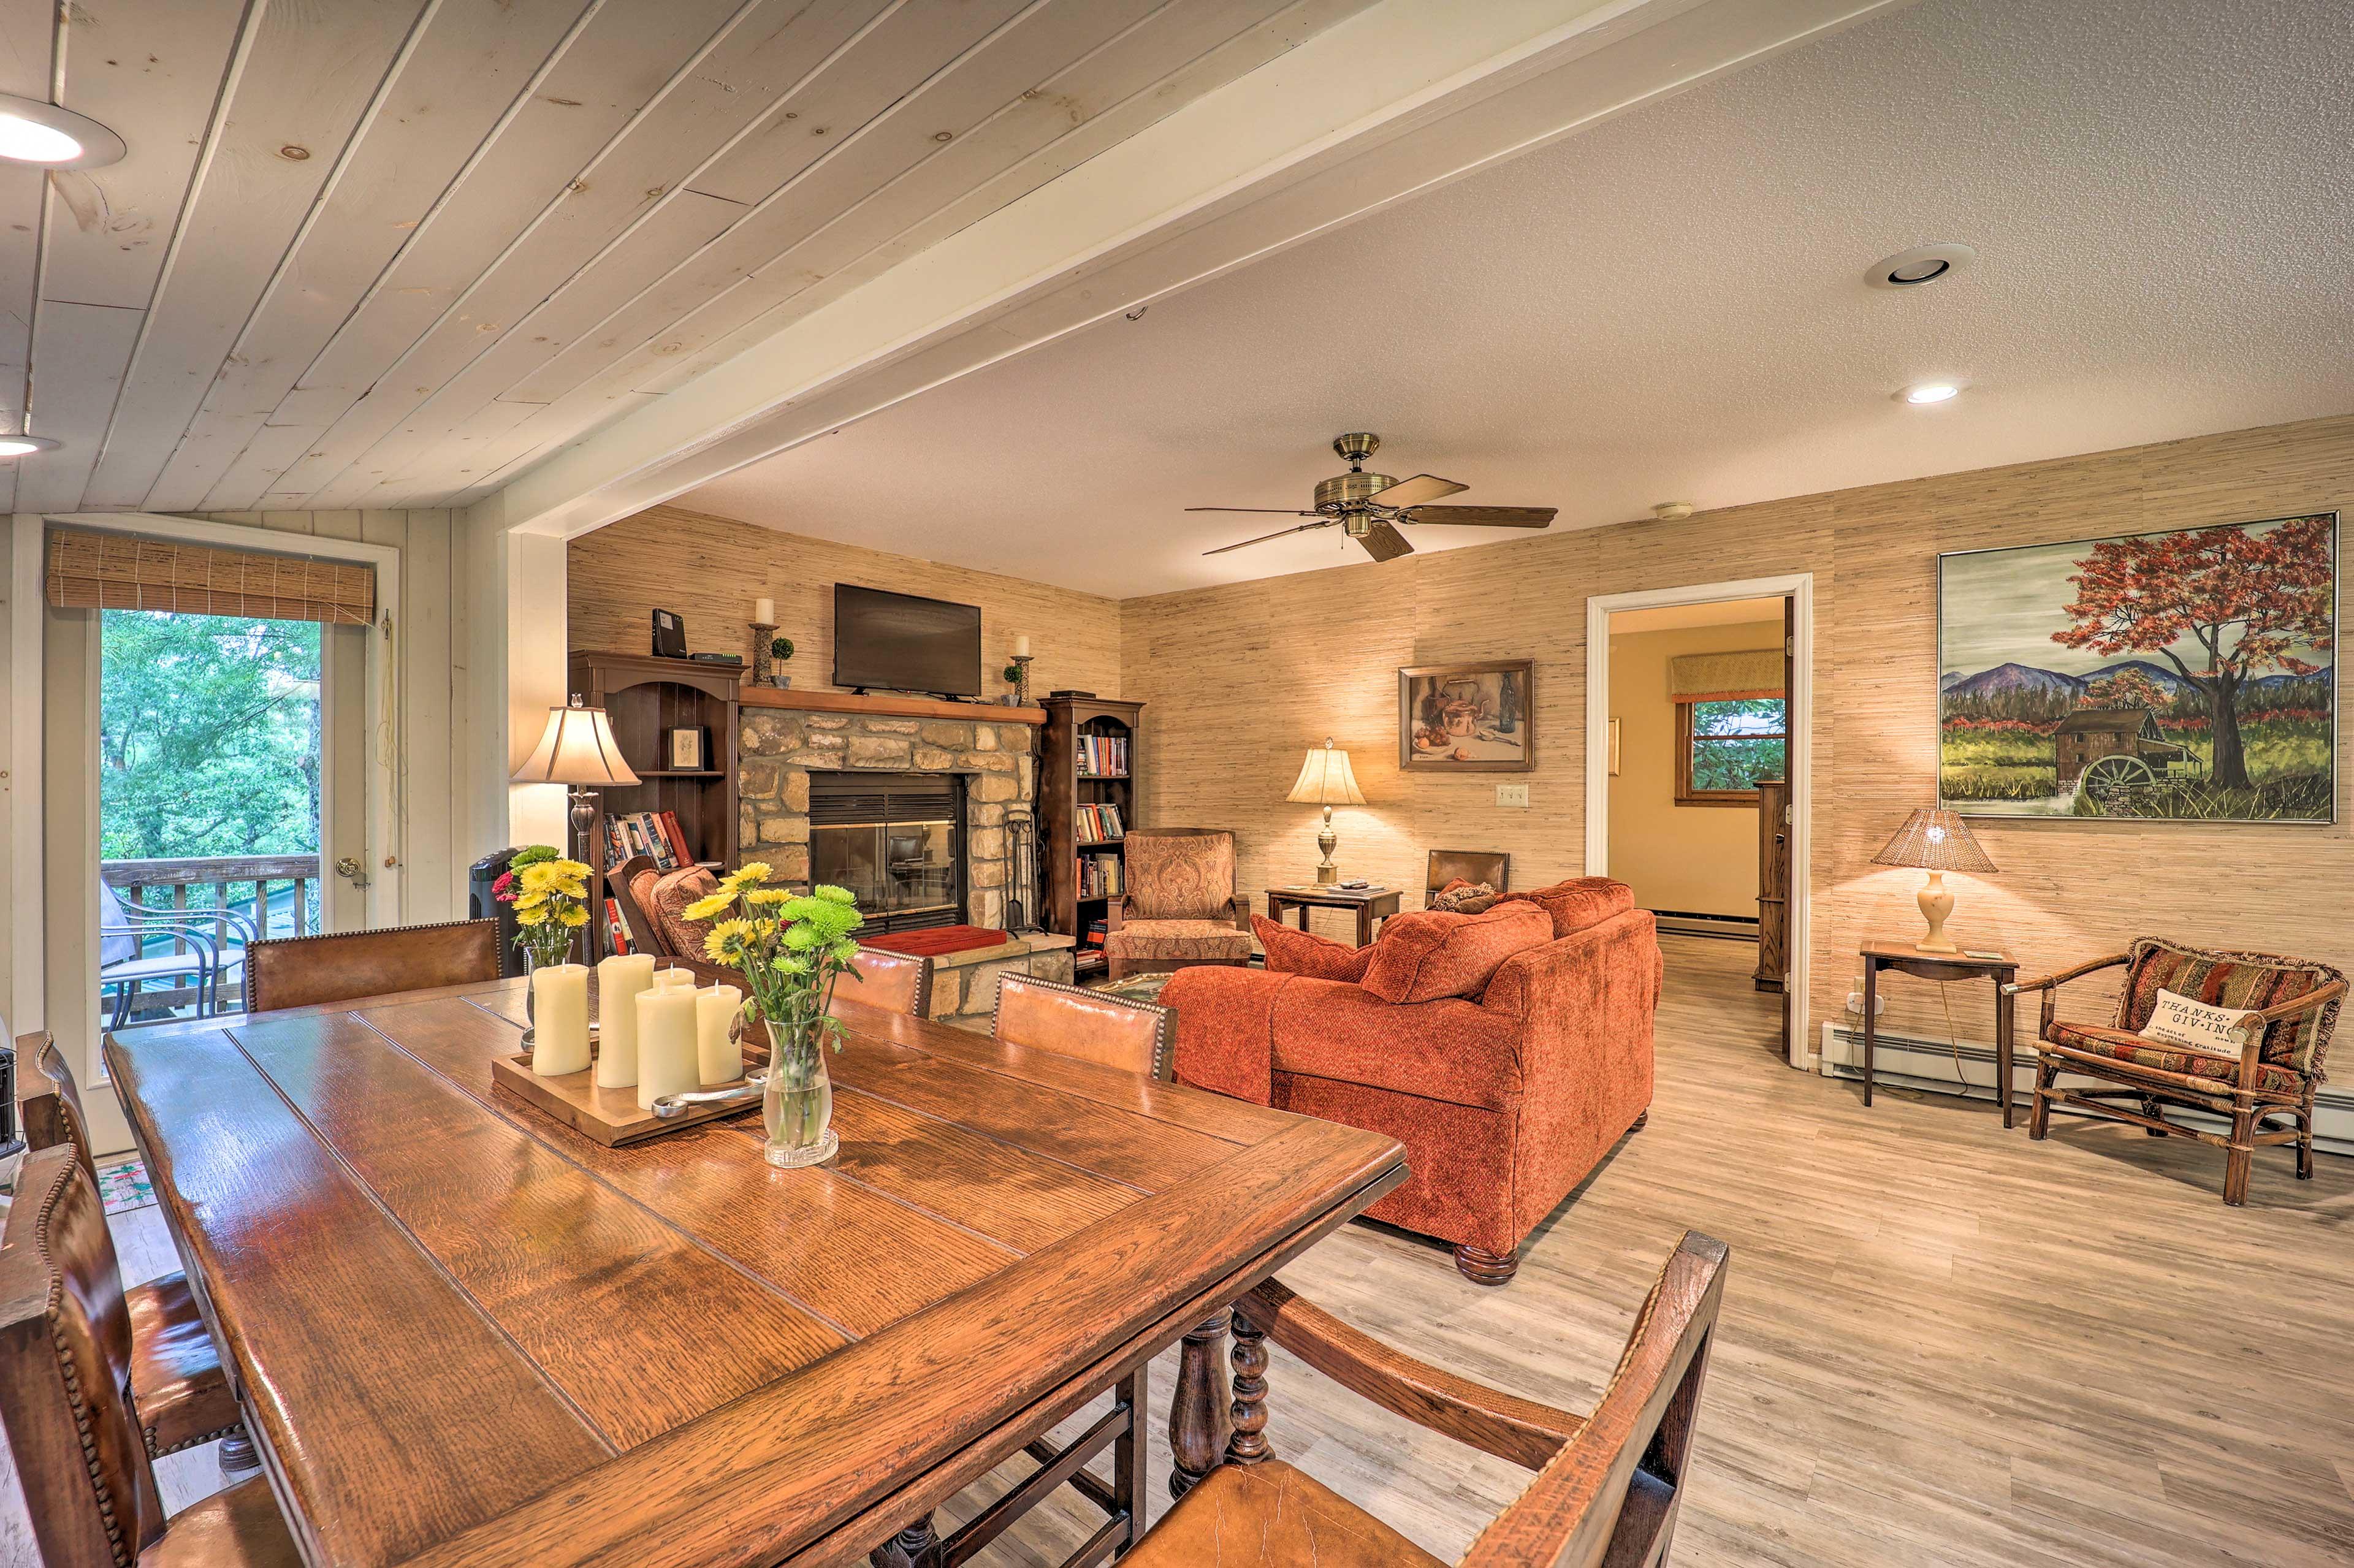 Newland Vacation Rental | 3 BD | 2.5 BA | 1,620 Sq Ft | 2 Stories